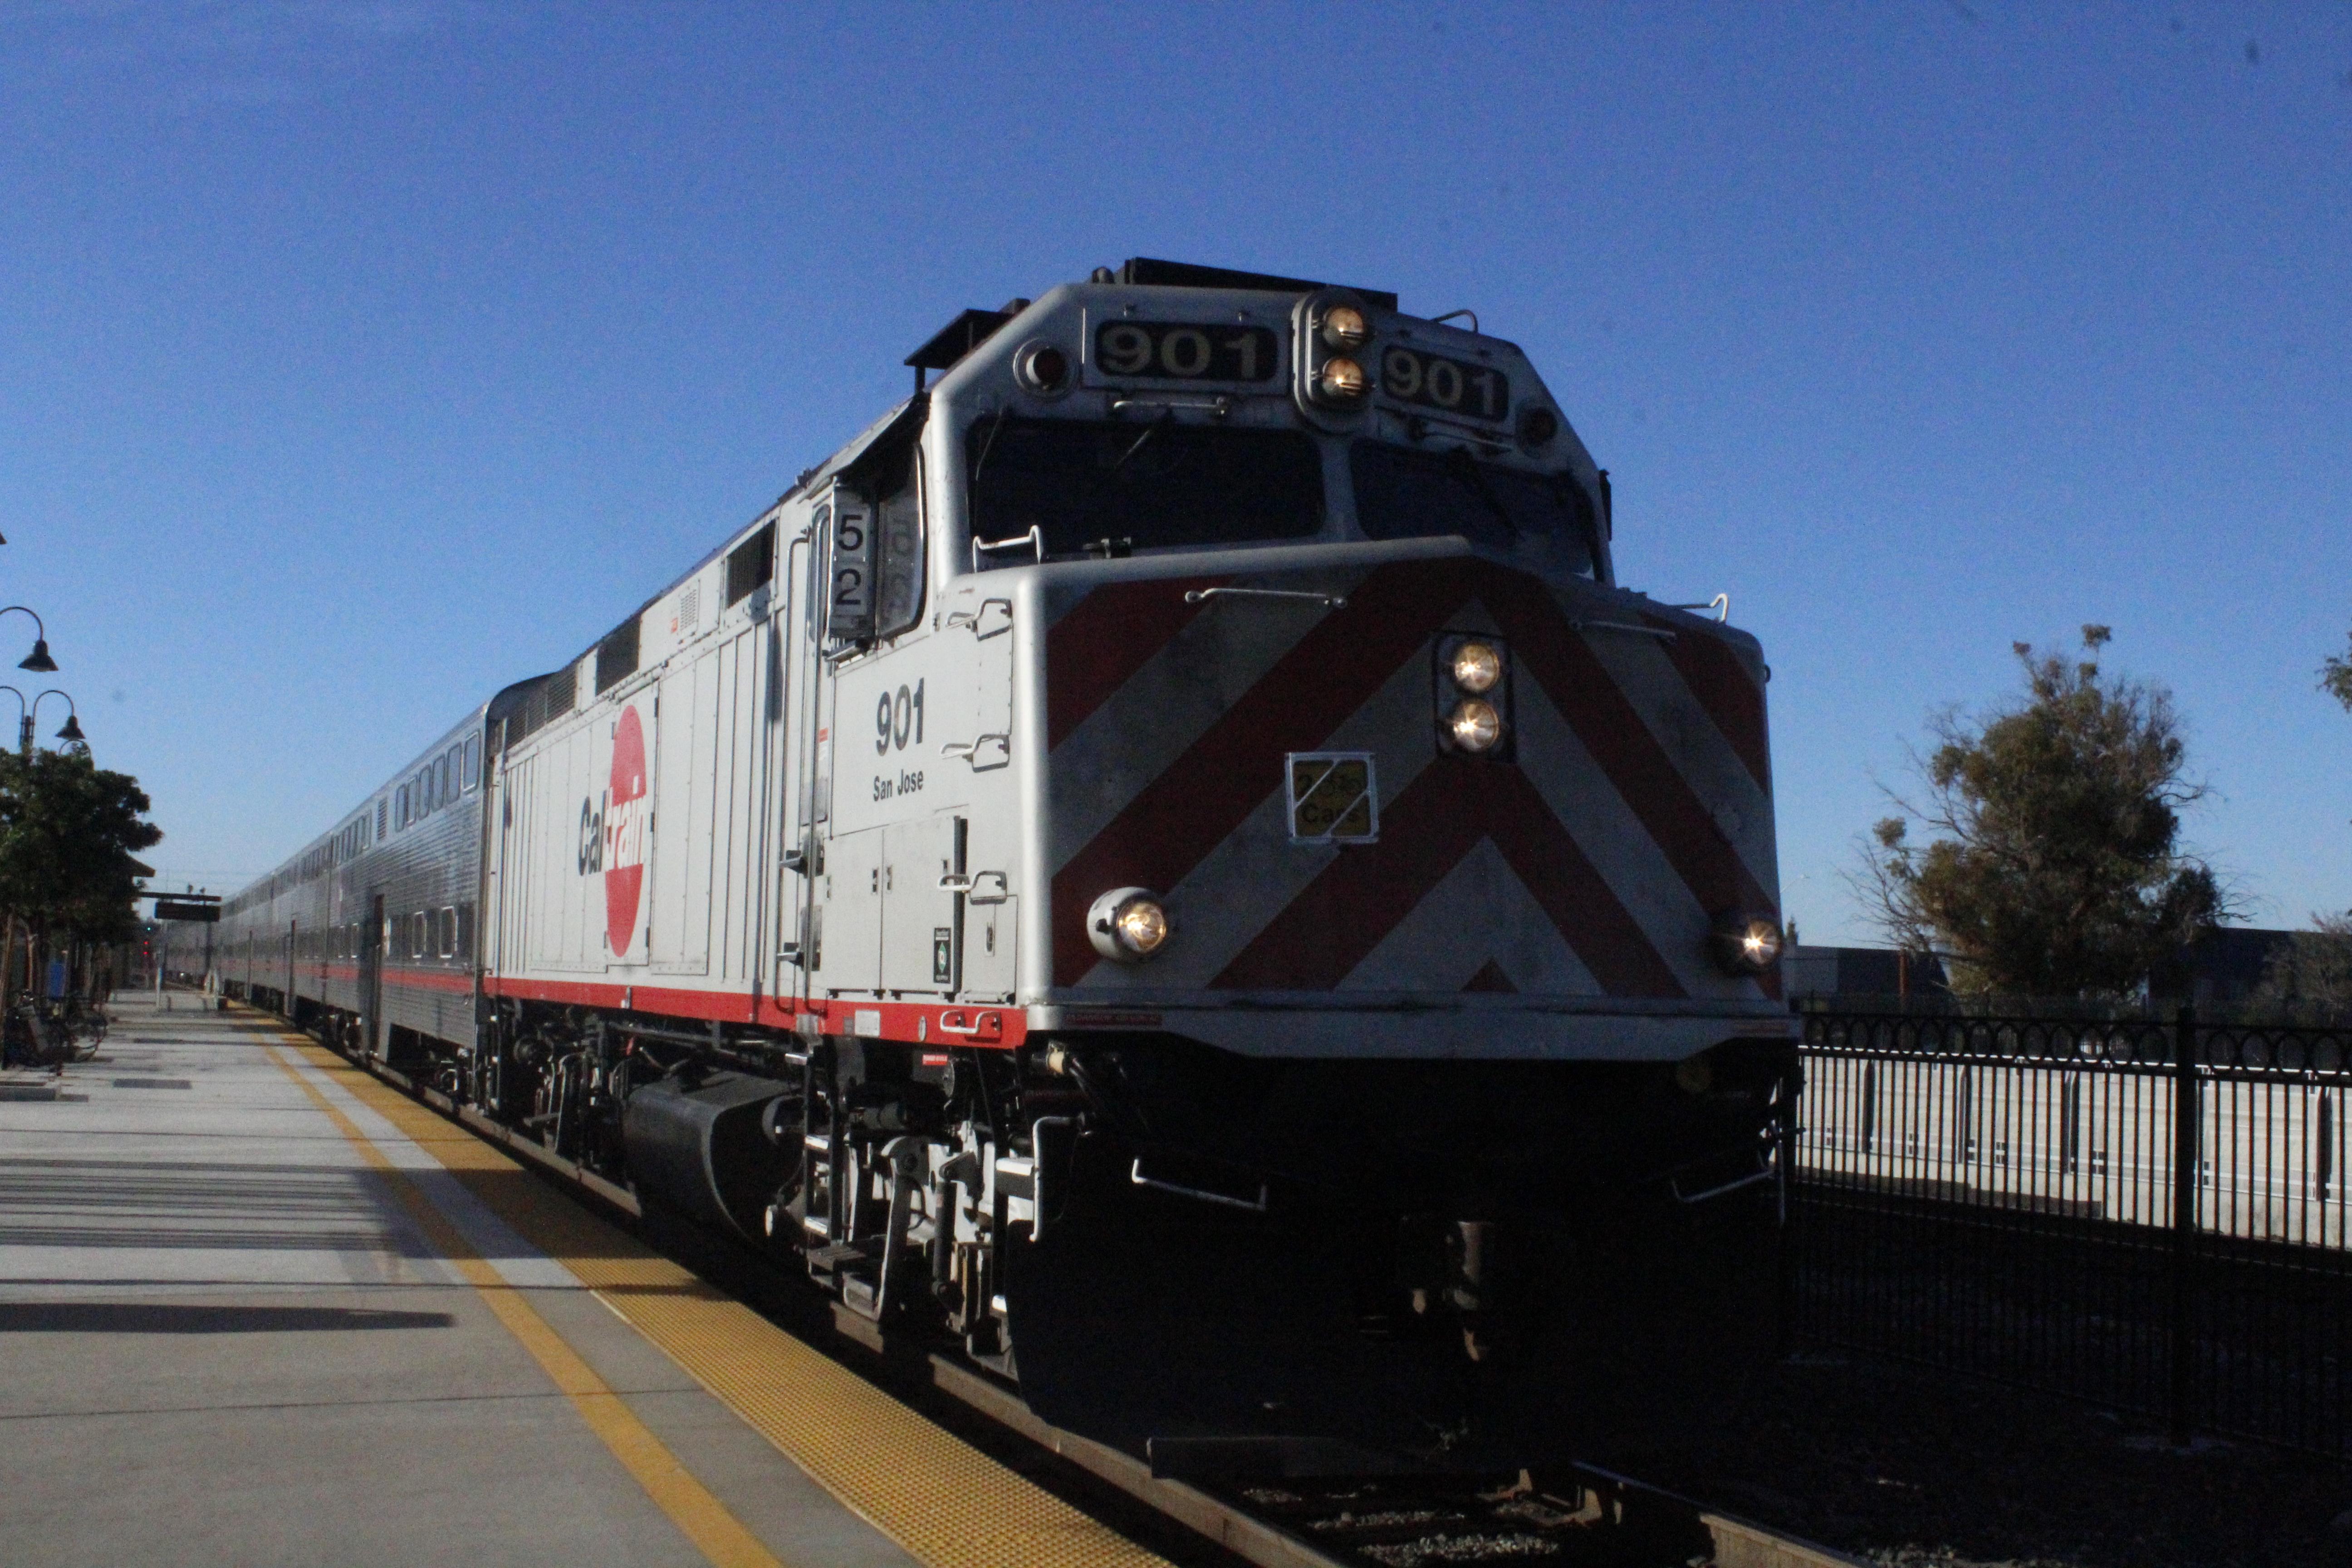 A Caltrain loco, unit 901, San Jose, leading a train to San Jose